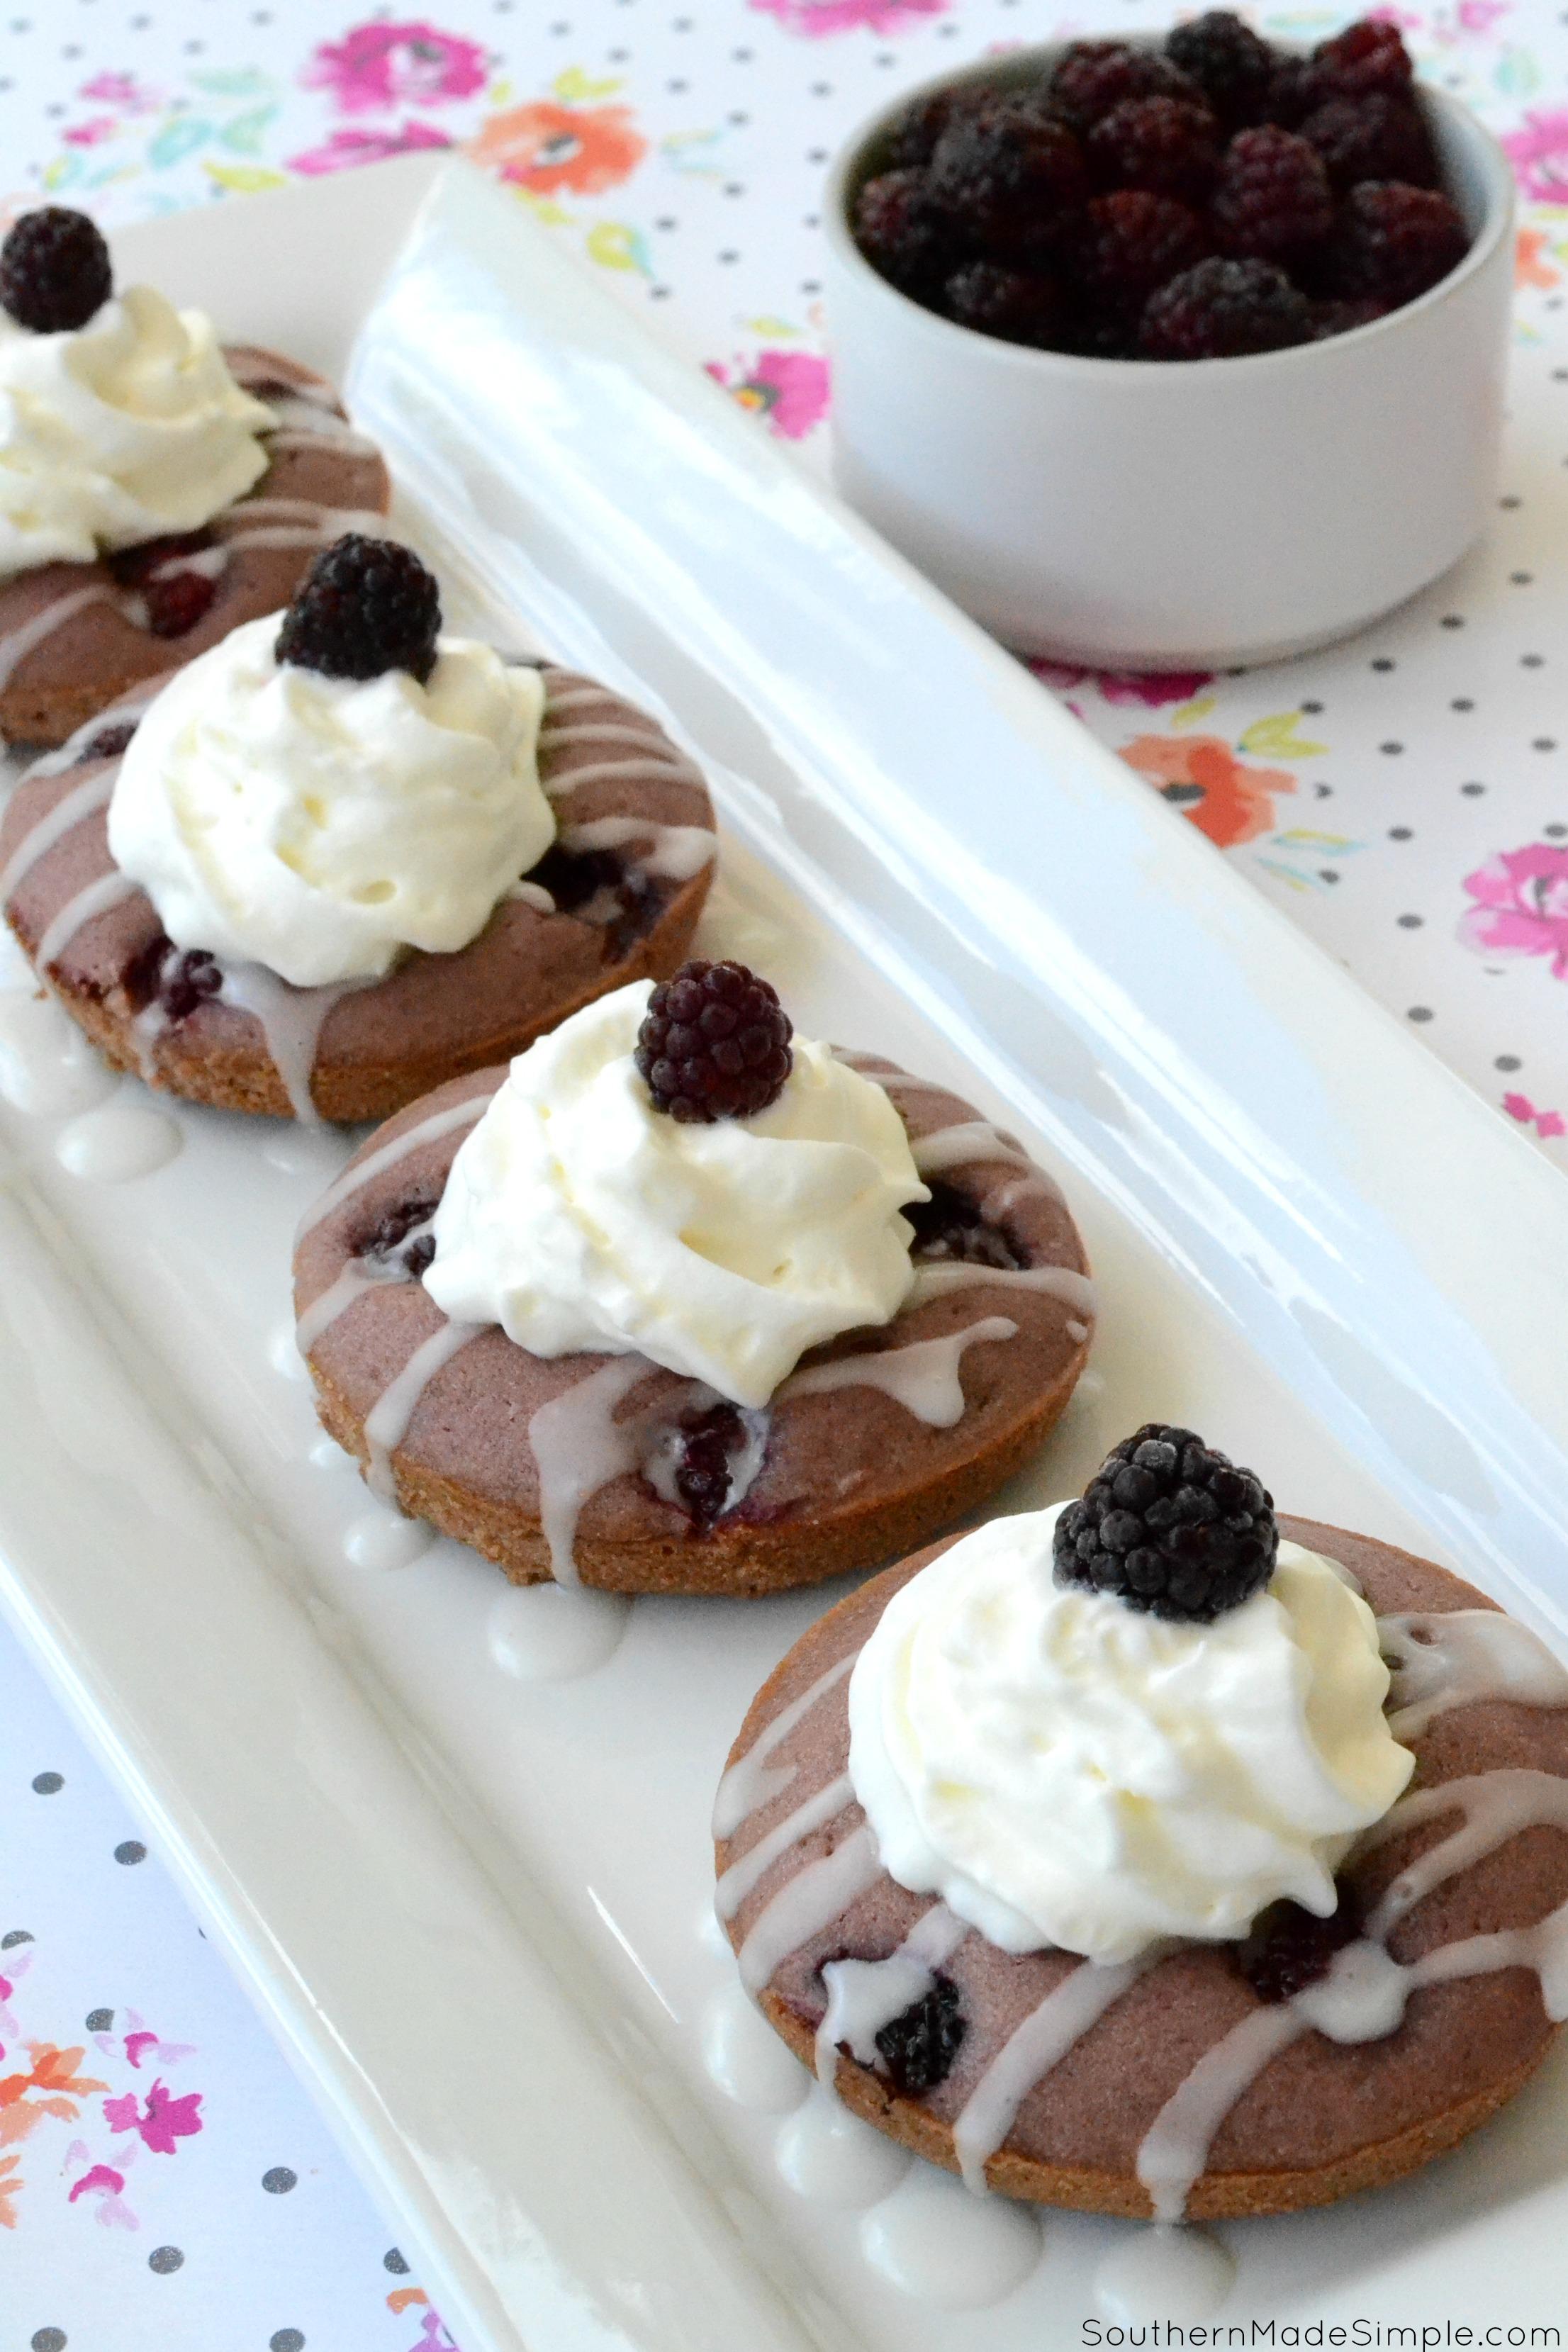 Glazed Blackberry Doughnuts